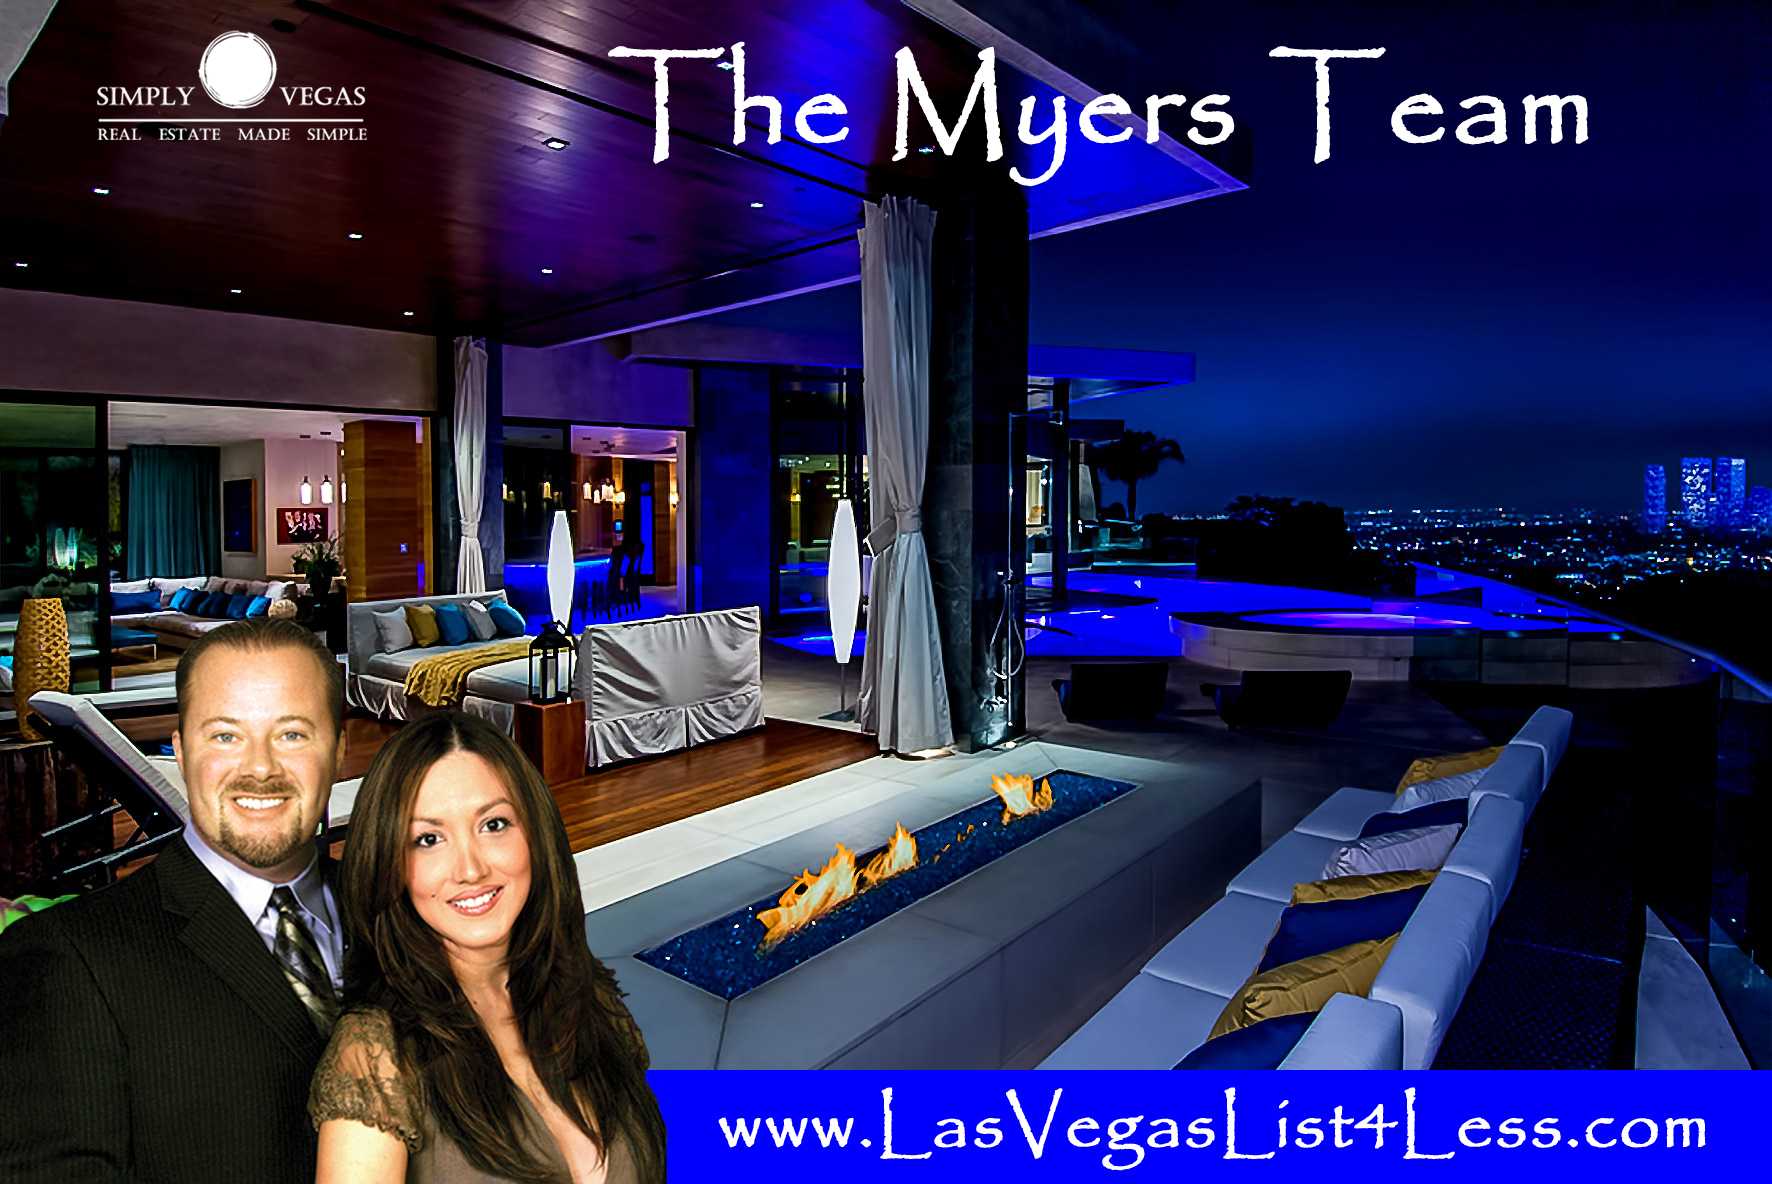 Las Vegas Top Real Estate Agent